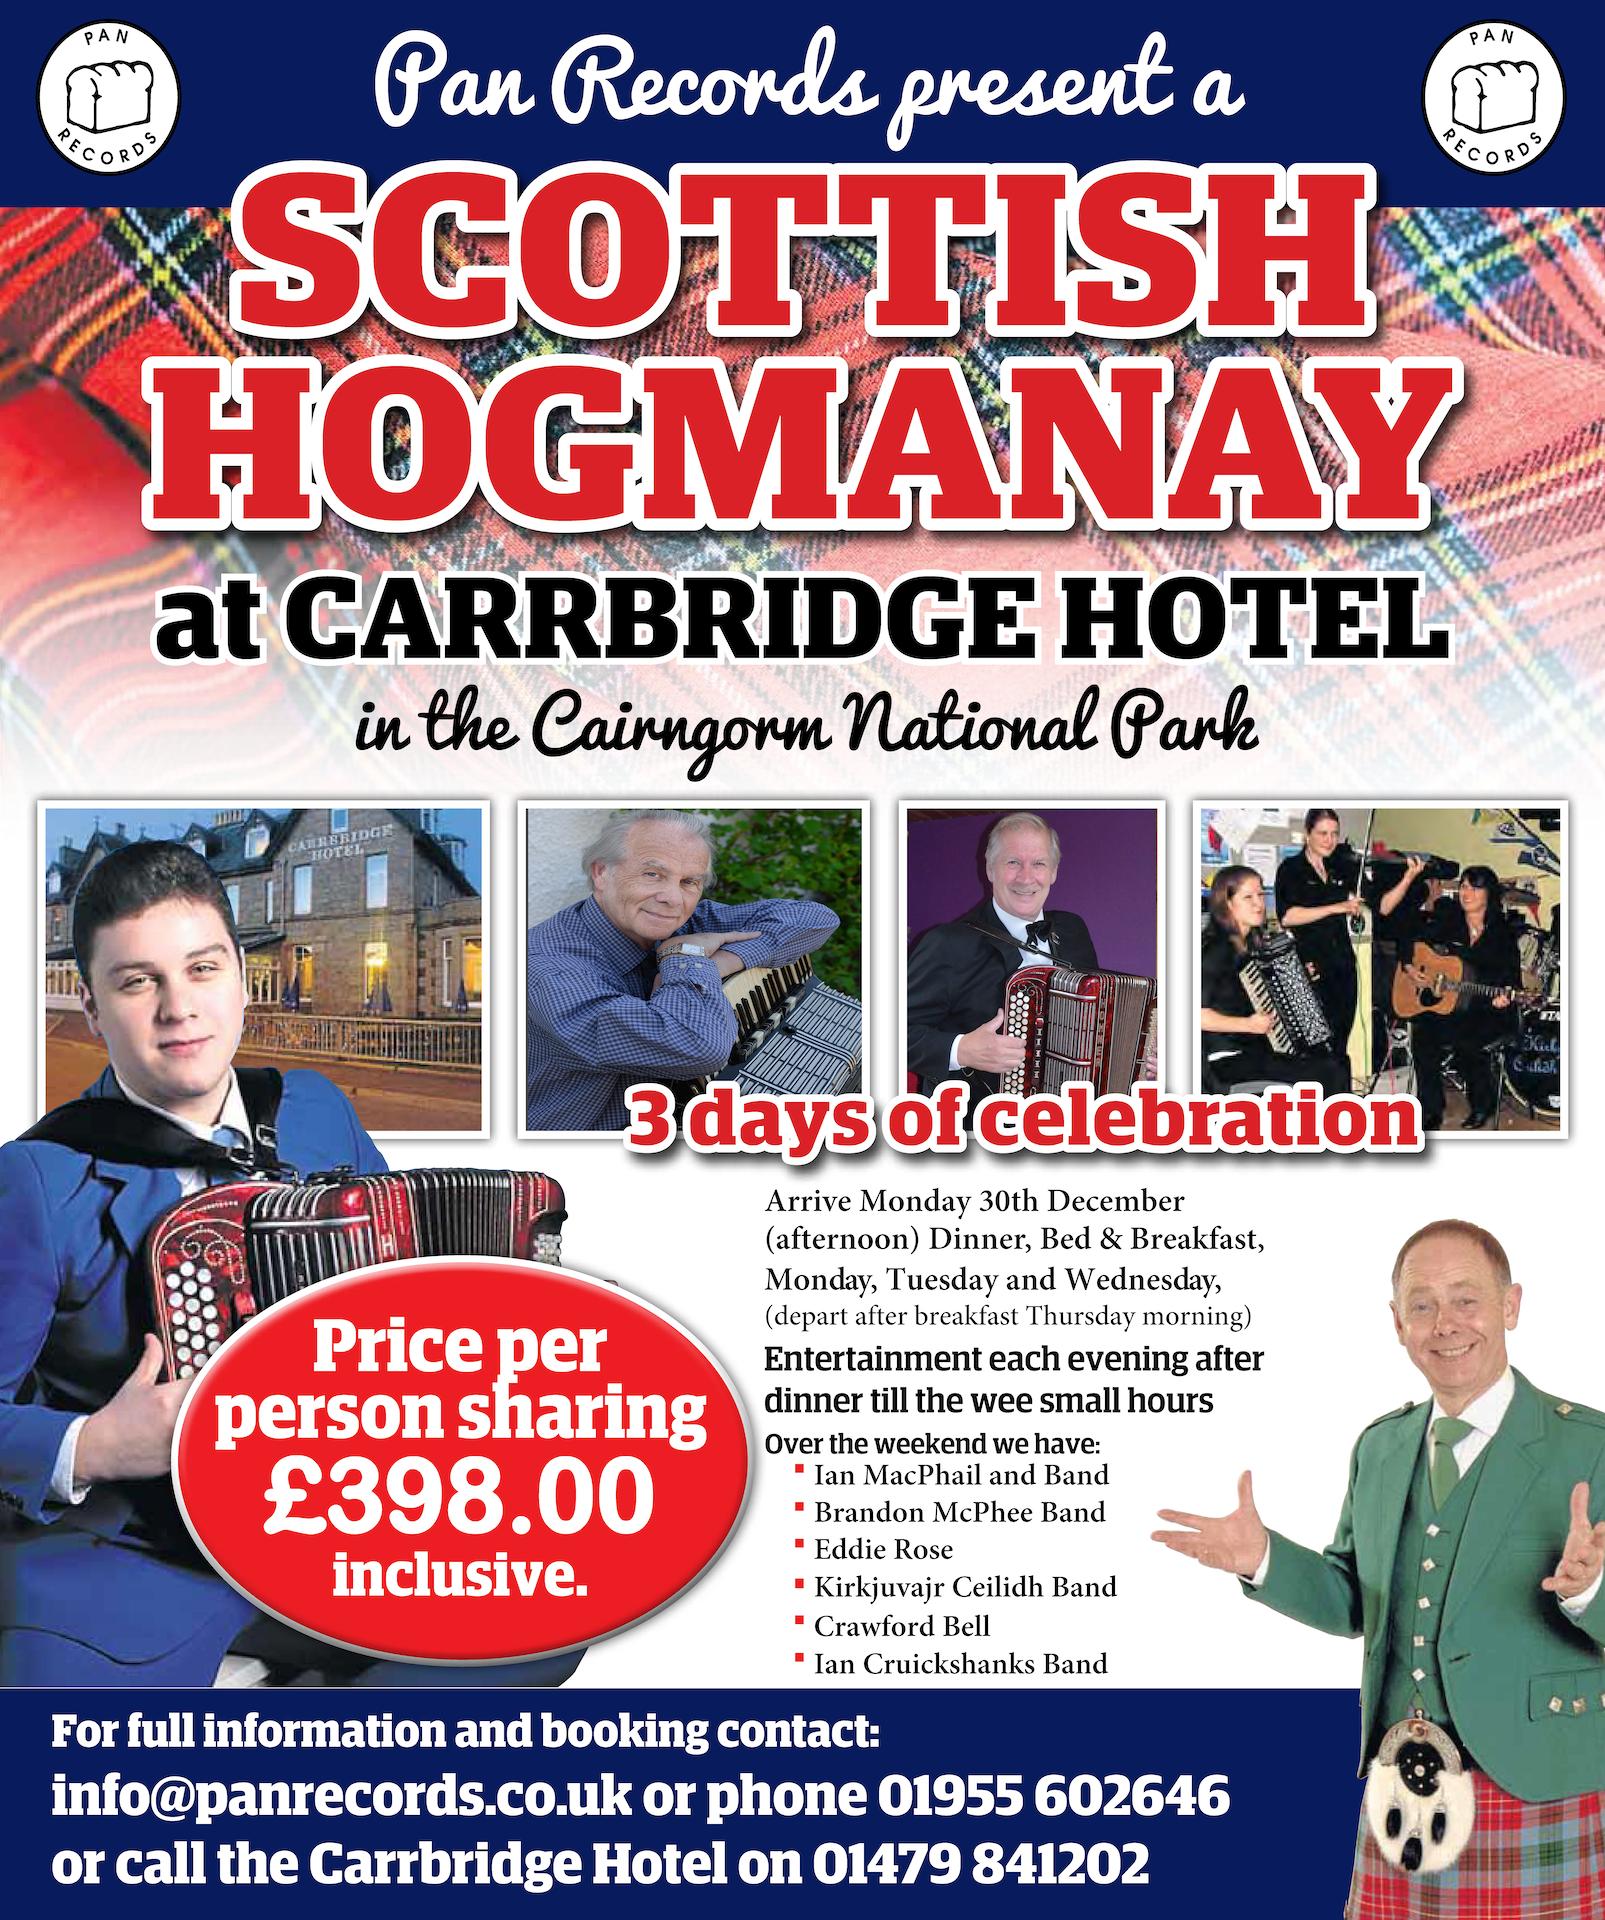 Carrbridge Hogmanay Leaflet 2019